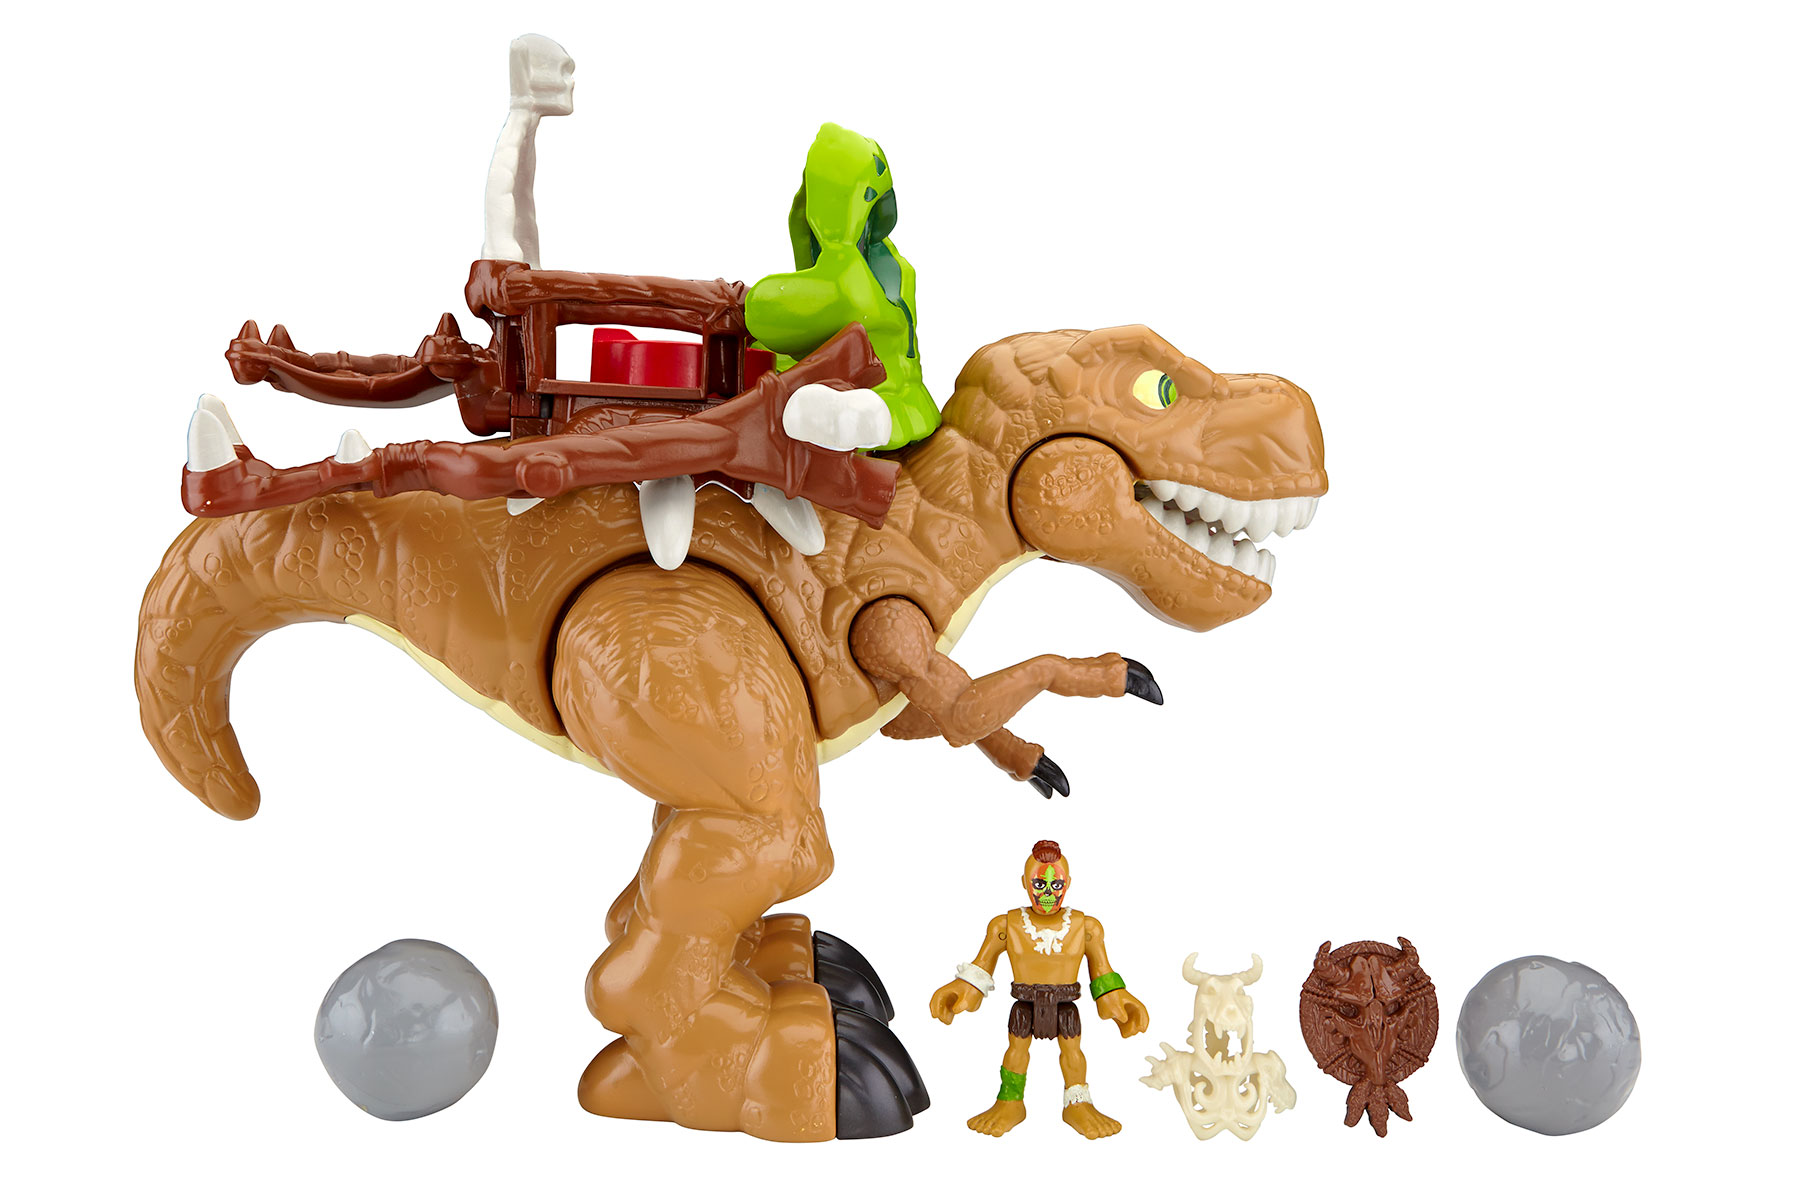 Imaginext Dino T-Rex PartNumber: 004W008005385001P KsnValue: 004W008005385001 MfgPartNumber: CDN91